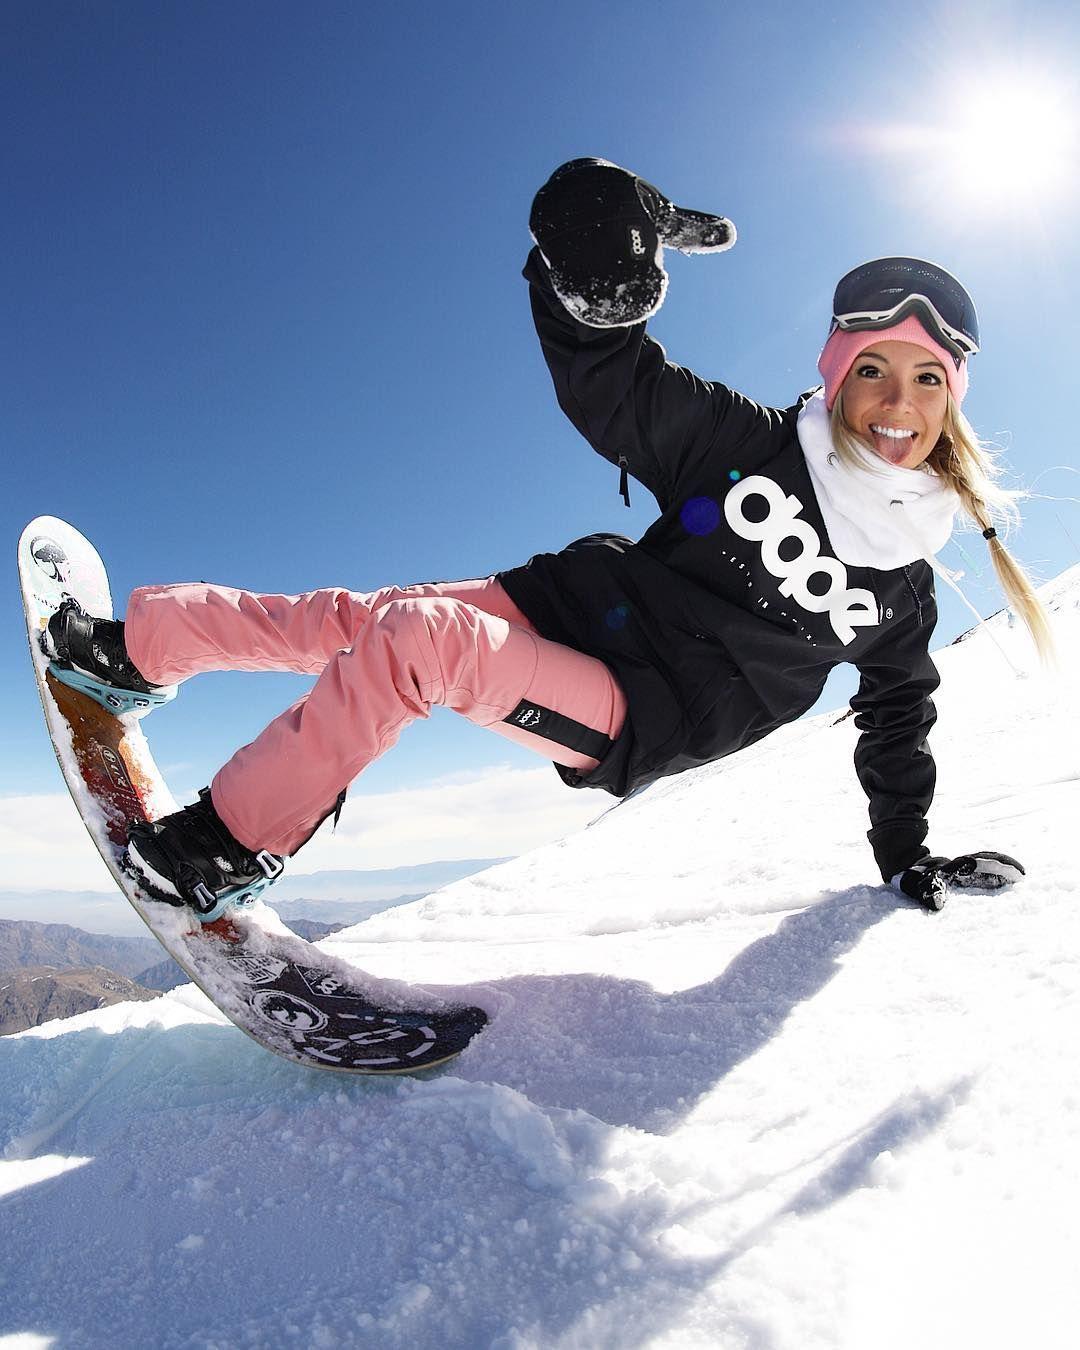 Snowboard Girl Snowboarding Women Snowboarding Outfit Snowboard Gear Women Snowboard Girl Snowboarding W Snowboarding Outfit Snowboard Girl Snowboarding Women